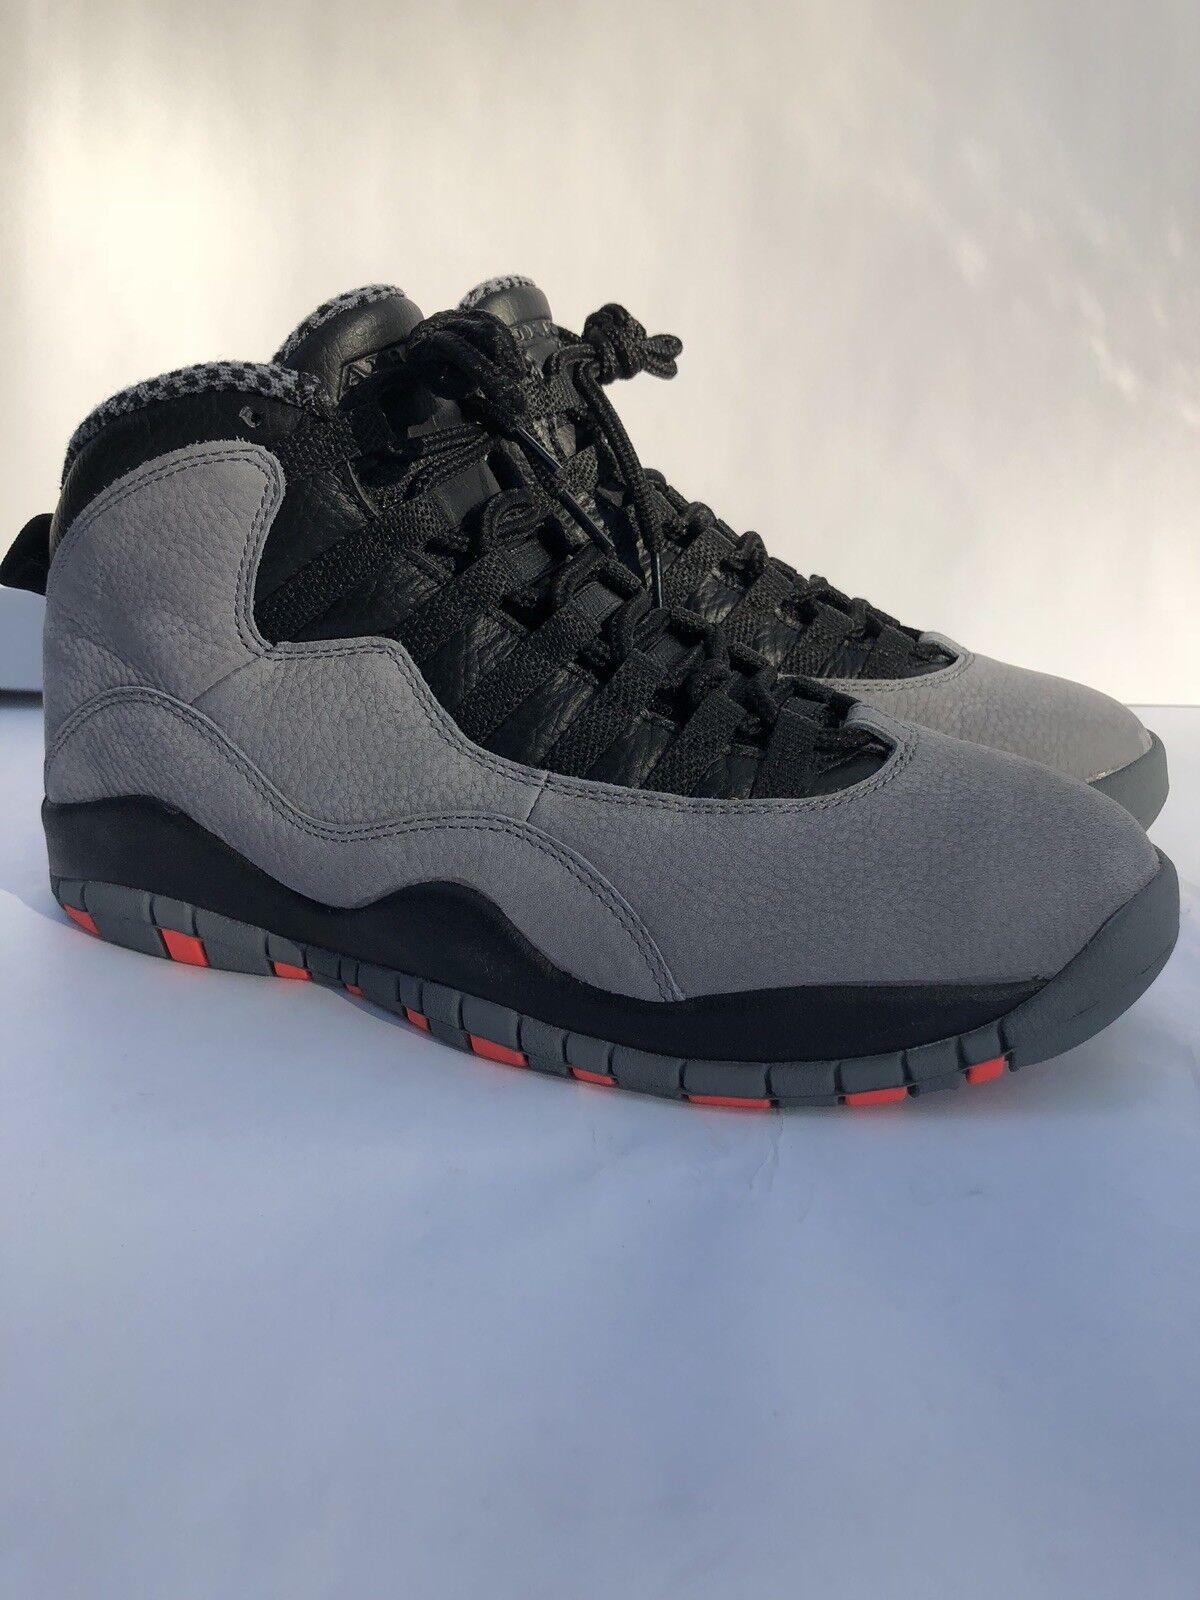 Deadstock Uomo's NIB Nike Air Jordan 10 X SZ 8.5 Grey Infrared 1 11 3 4 6 XI I